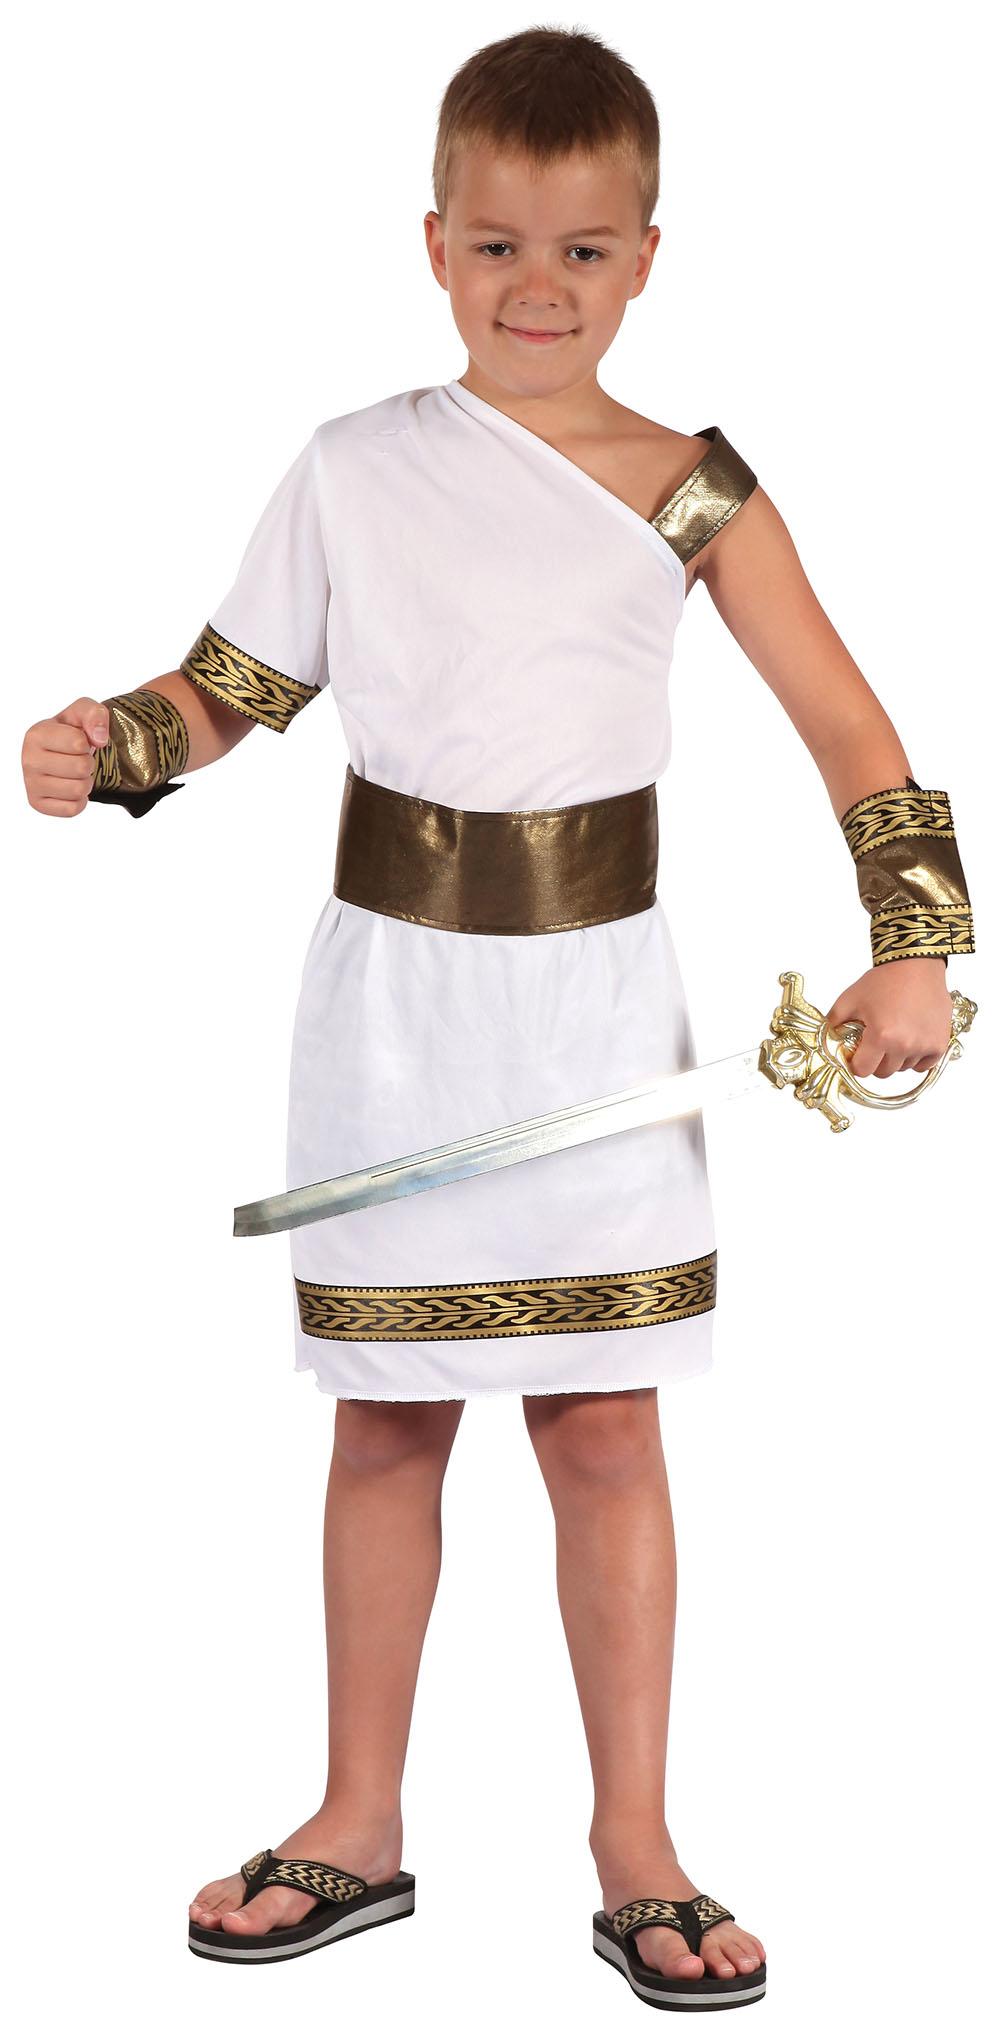 Childrens Boys Roman Centurion Gladiator Fancy Dress Costume Childs Outfit New w